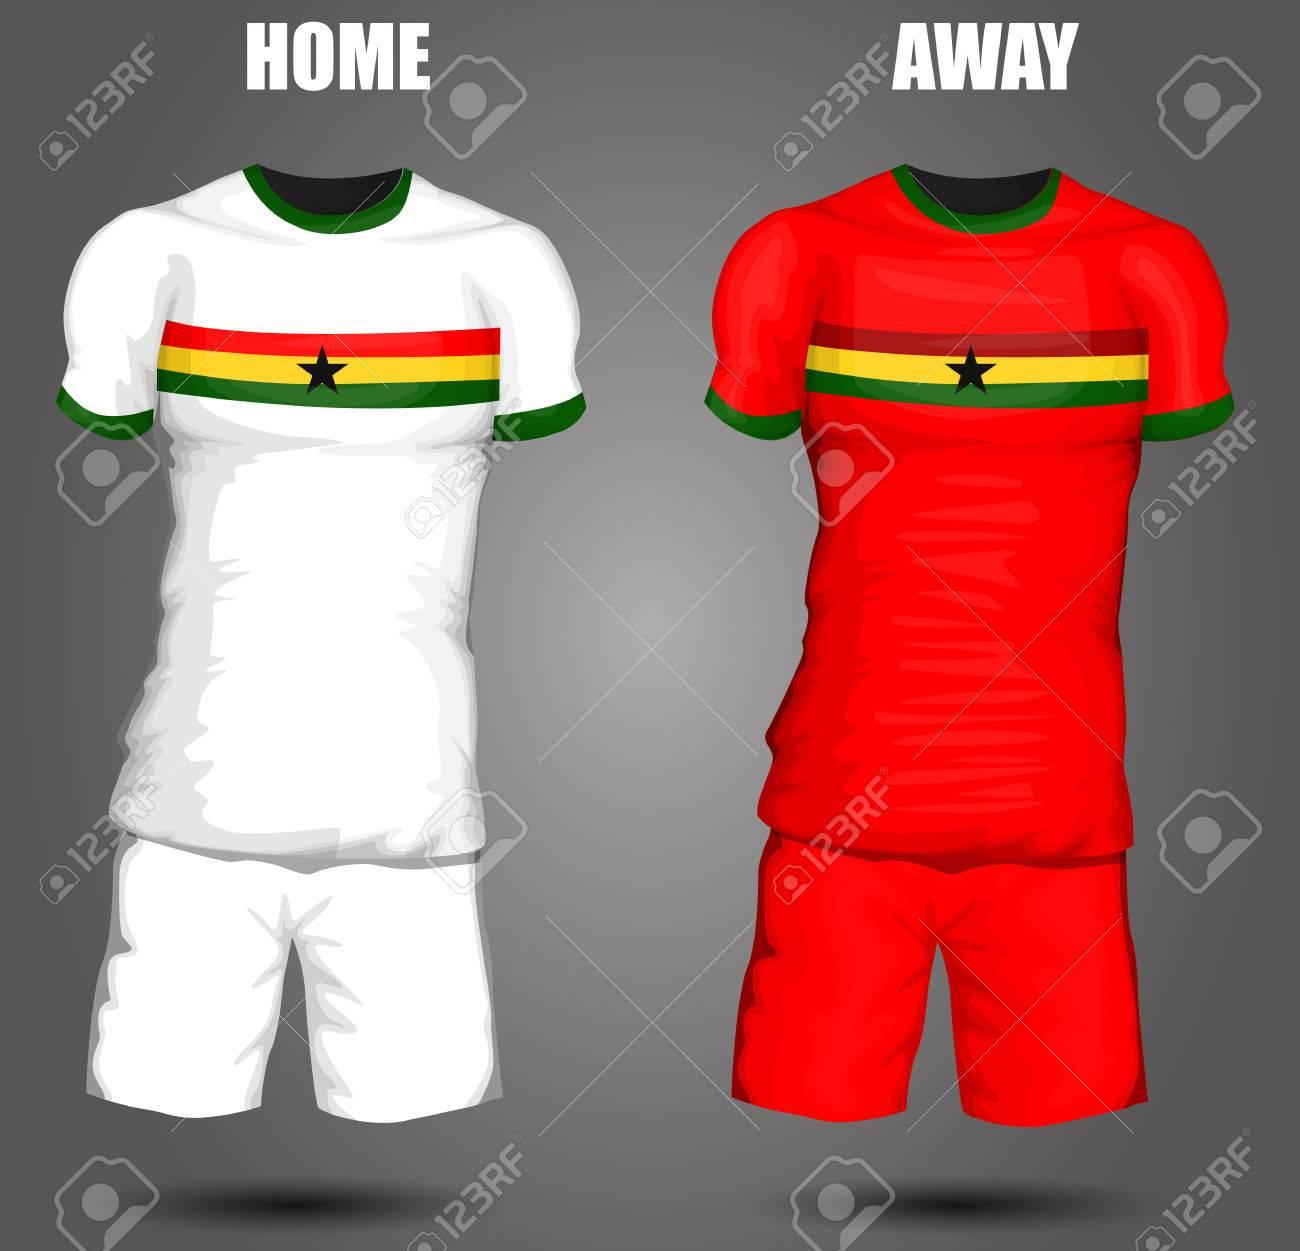 60ecbad6b Ghana soccer jersey Stock Vector - 28036607